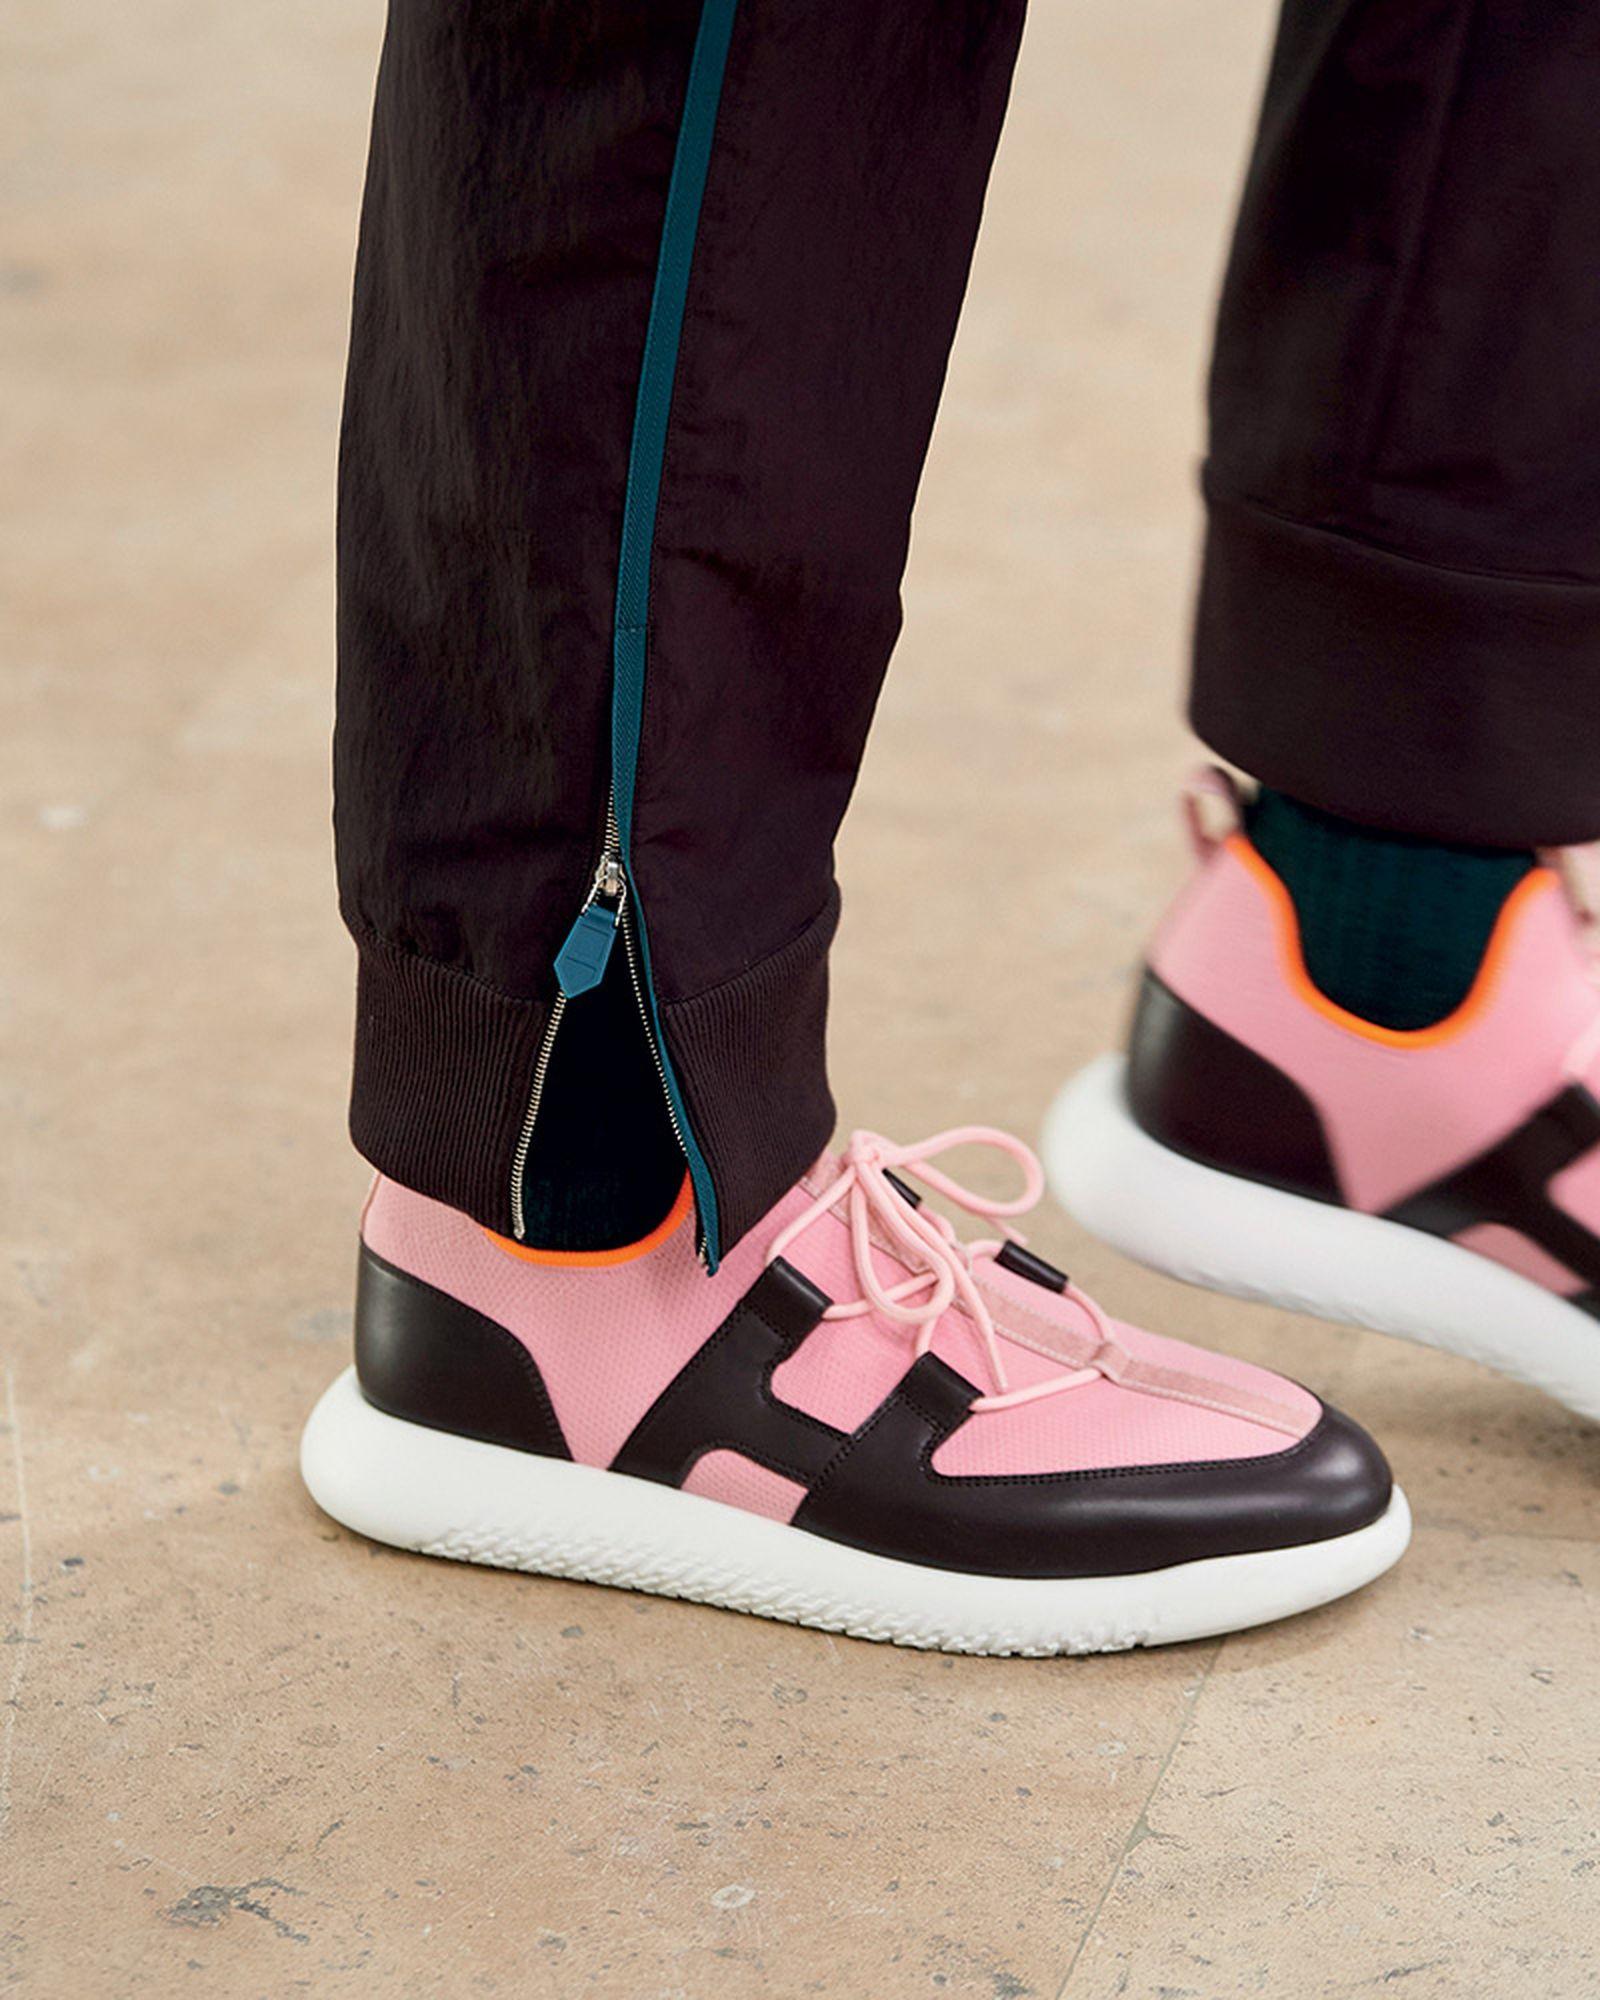 fashion-week-fw21-sneaker-roundup-hermes-01